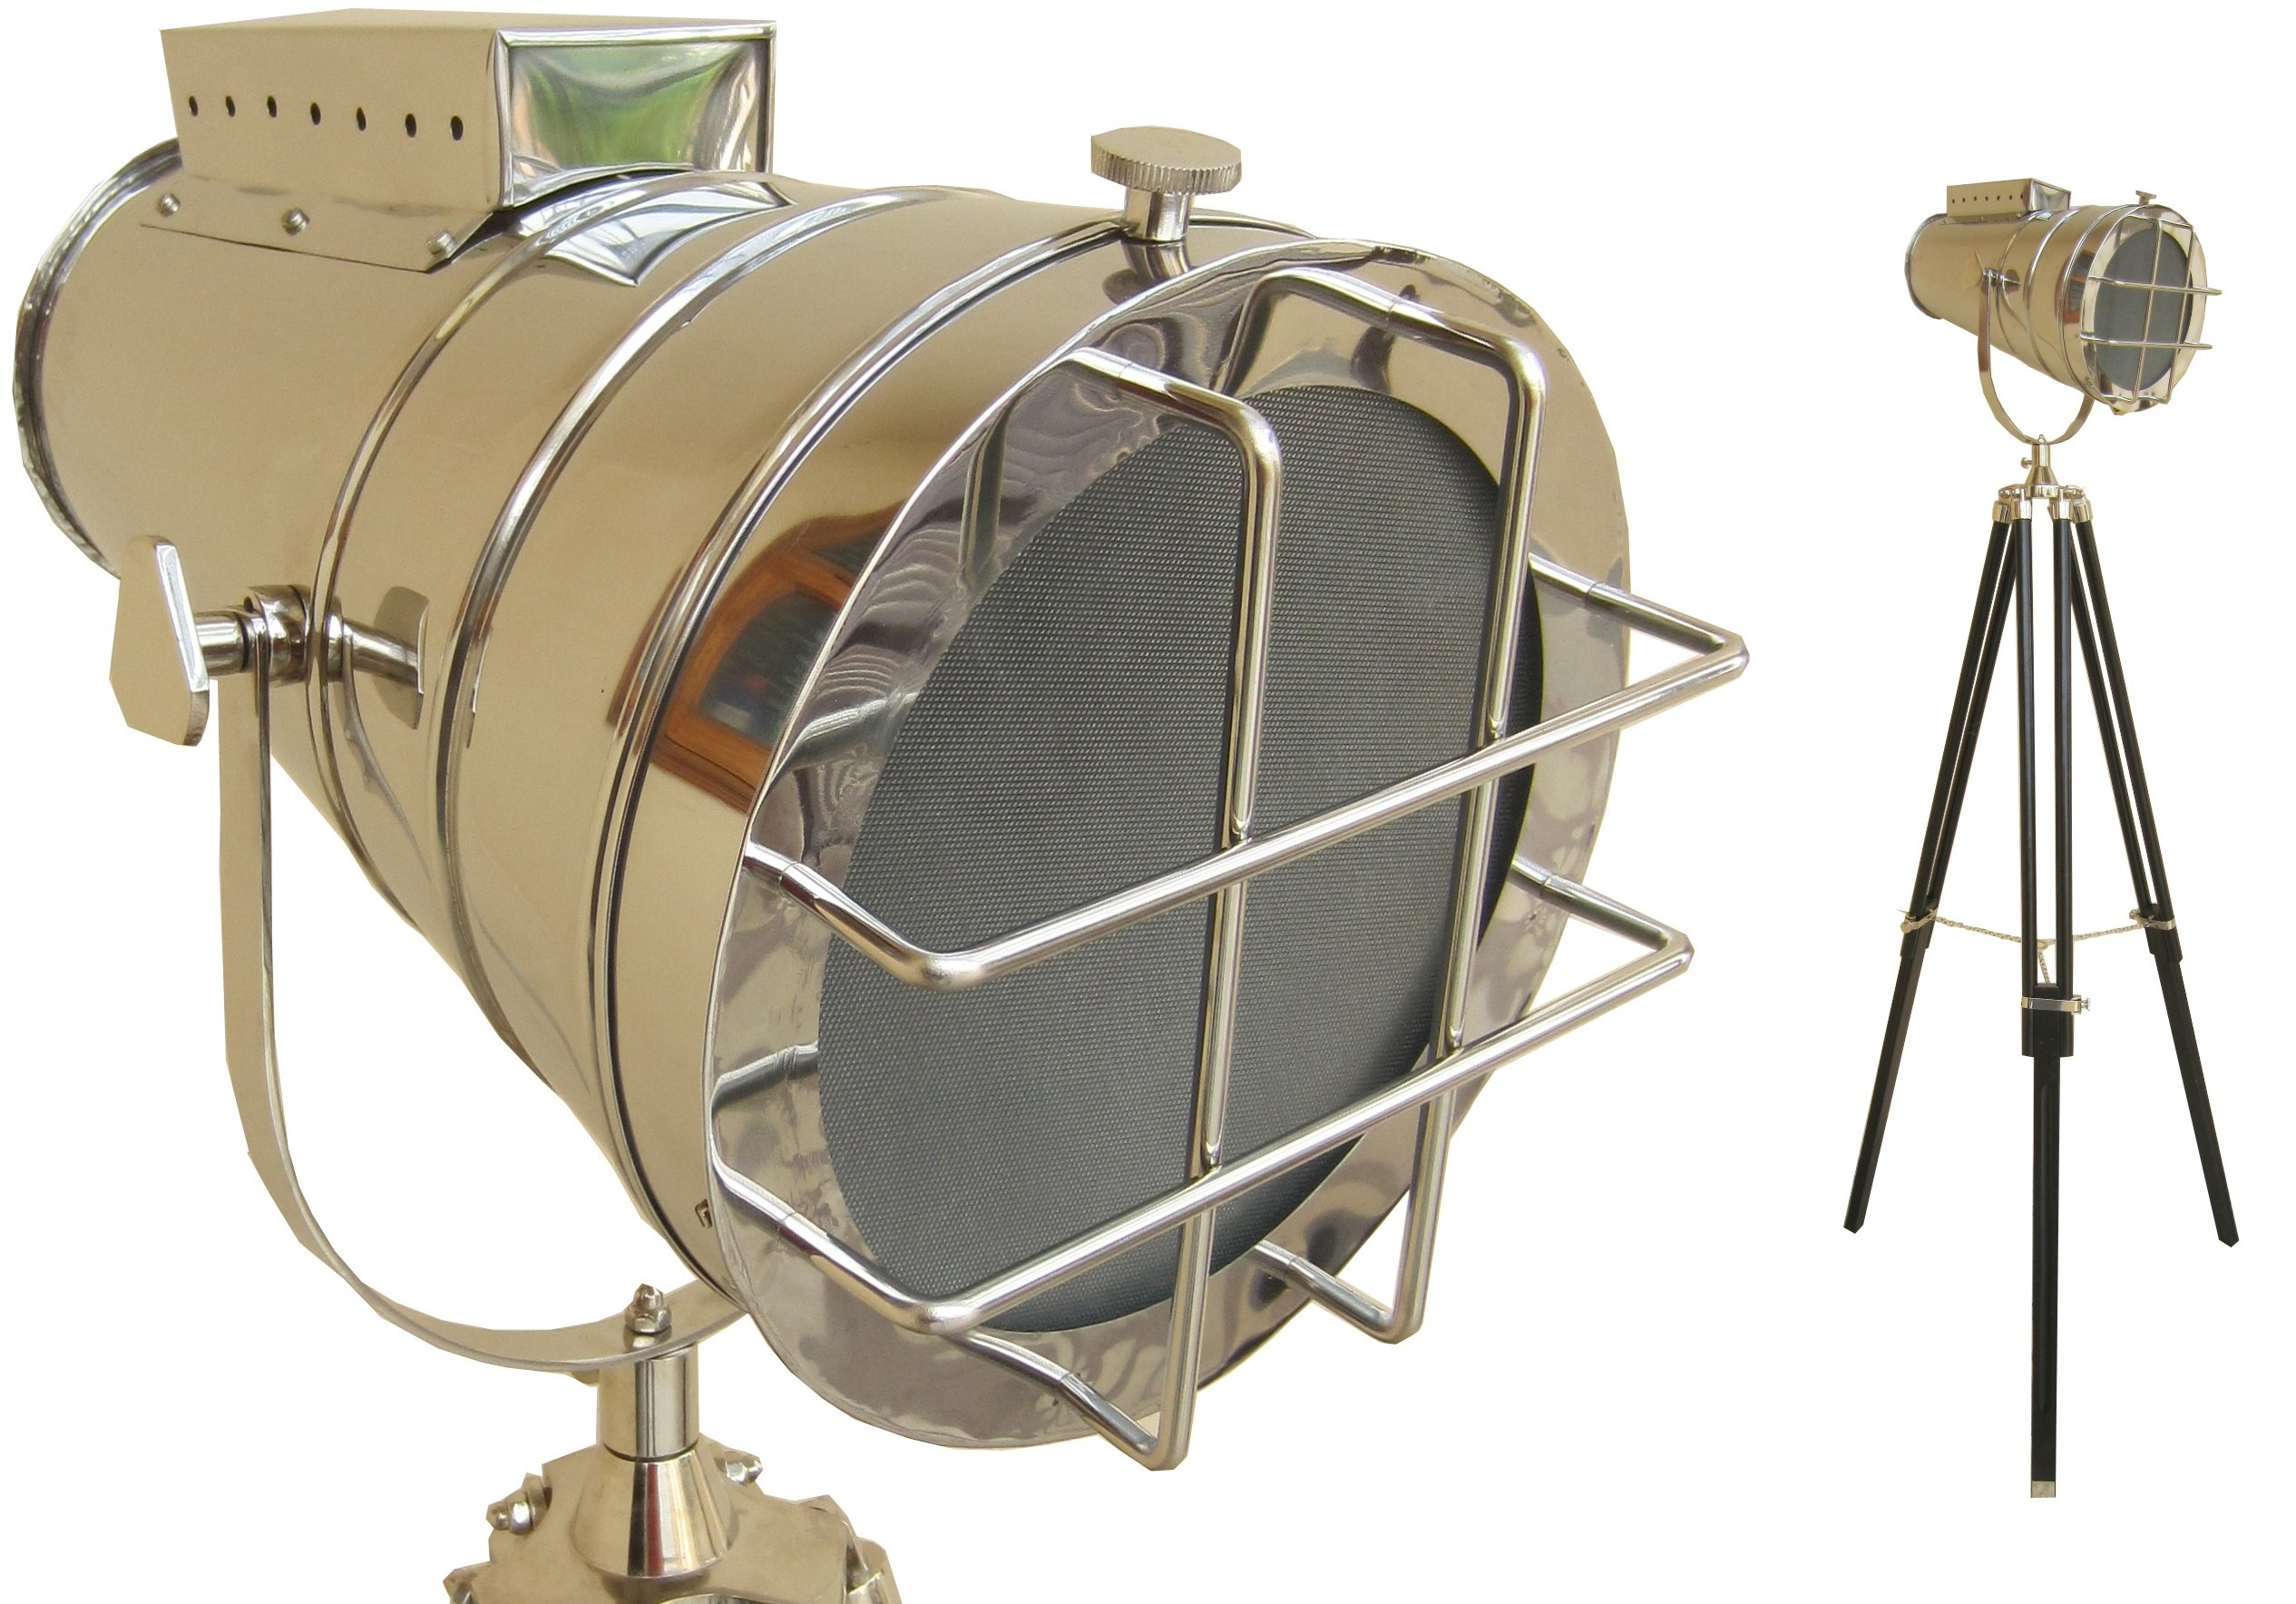 medieval replicas Floor Lamp Home Decorative Vintage Design Tripod Lighting Searchlight Spot Light